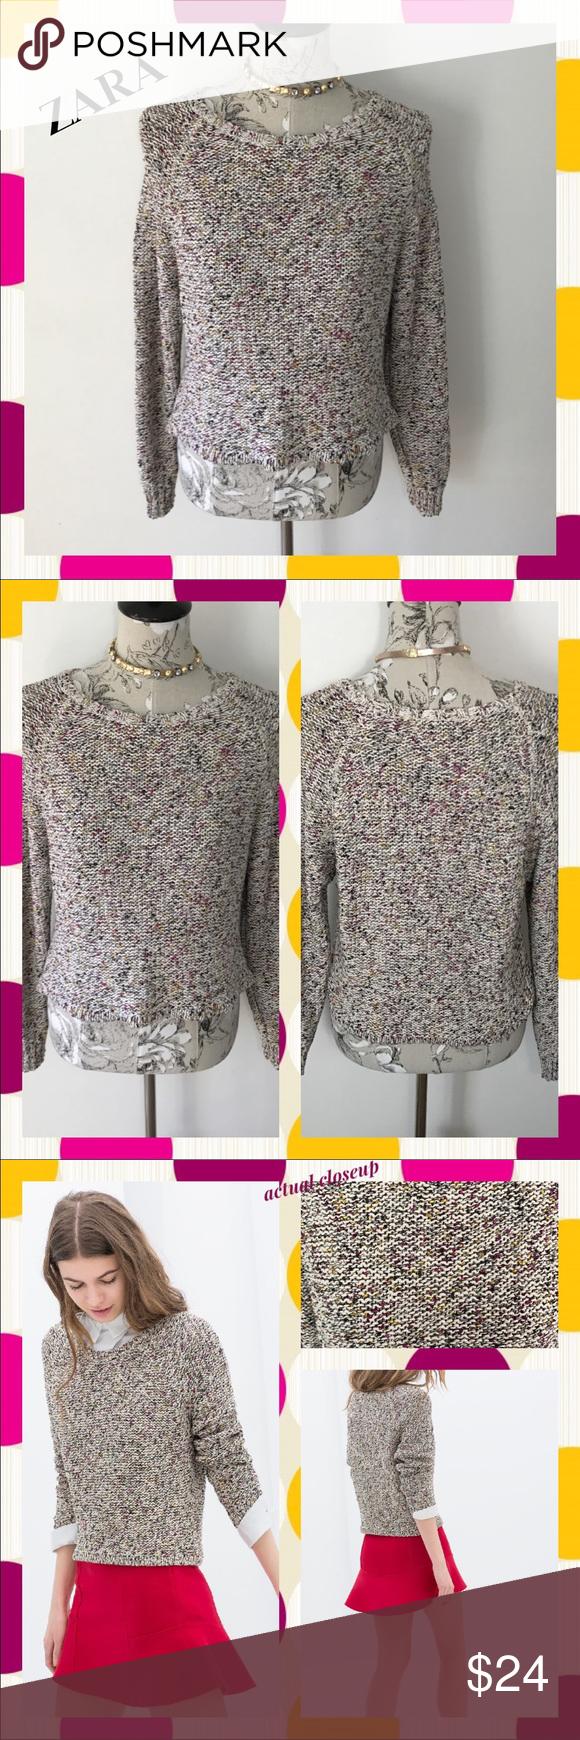 6b2fcad7 ZARA Multithread Pullover Bright Specks Sweater~ This Zara Trafaluc ...